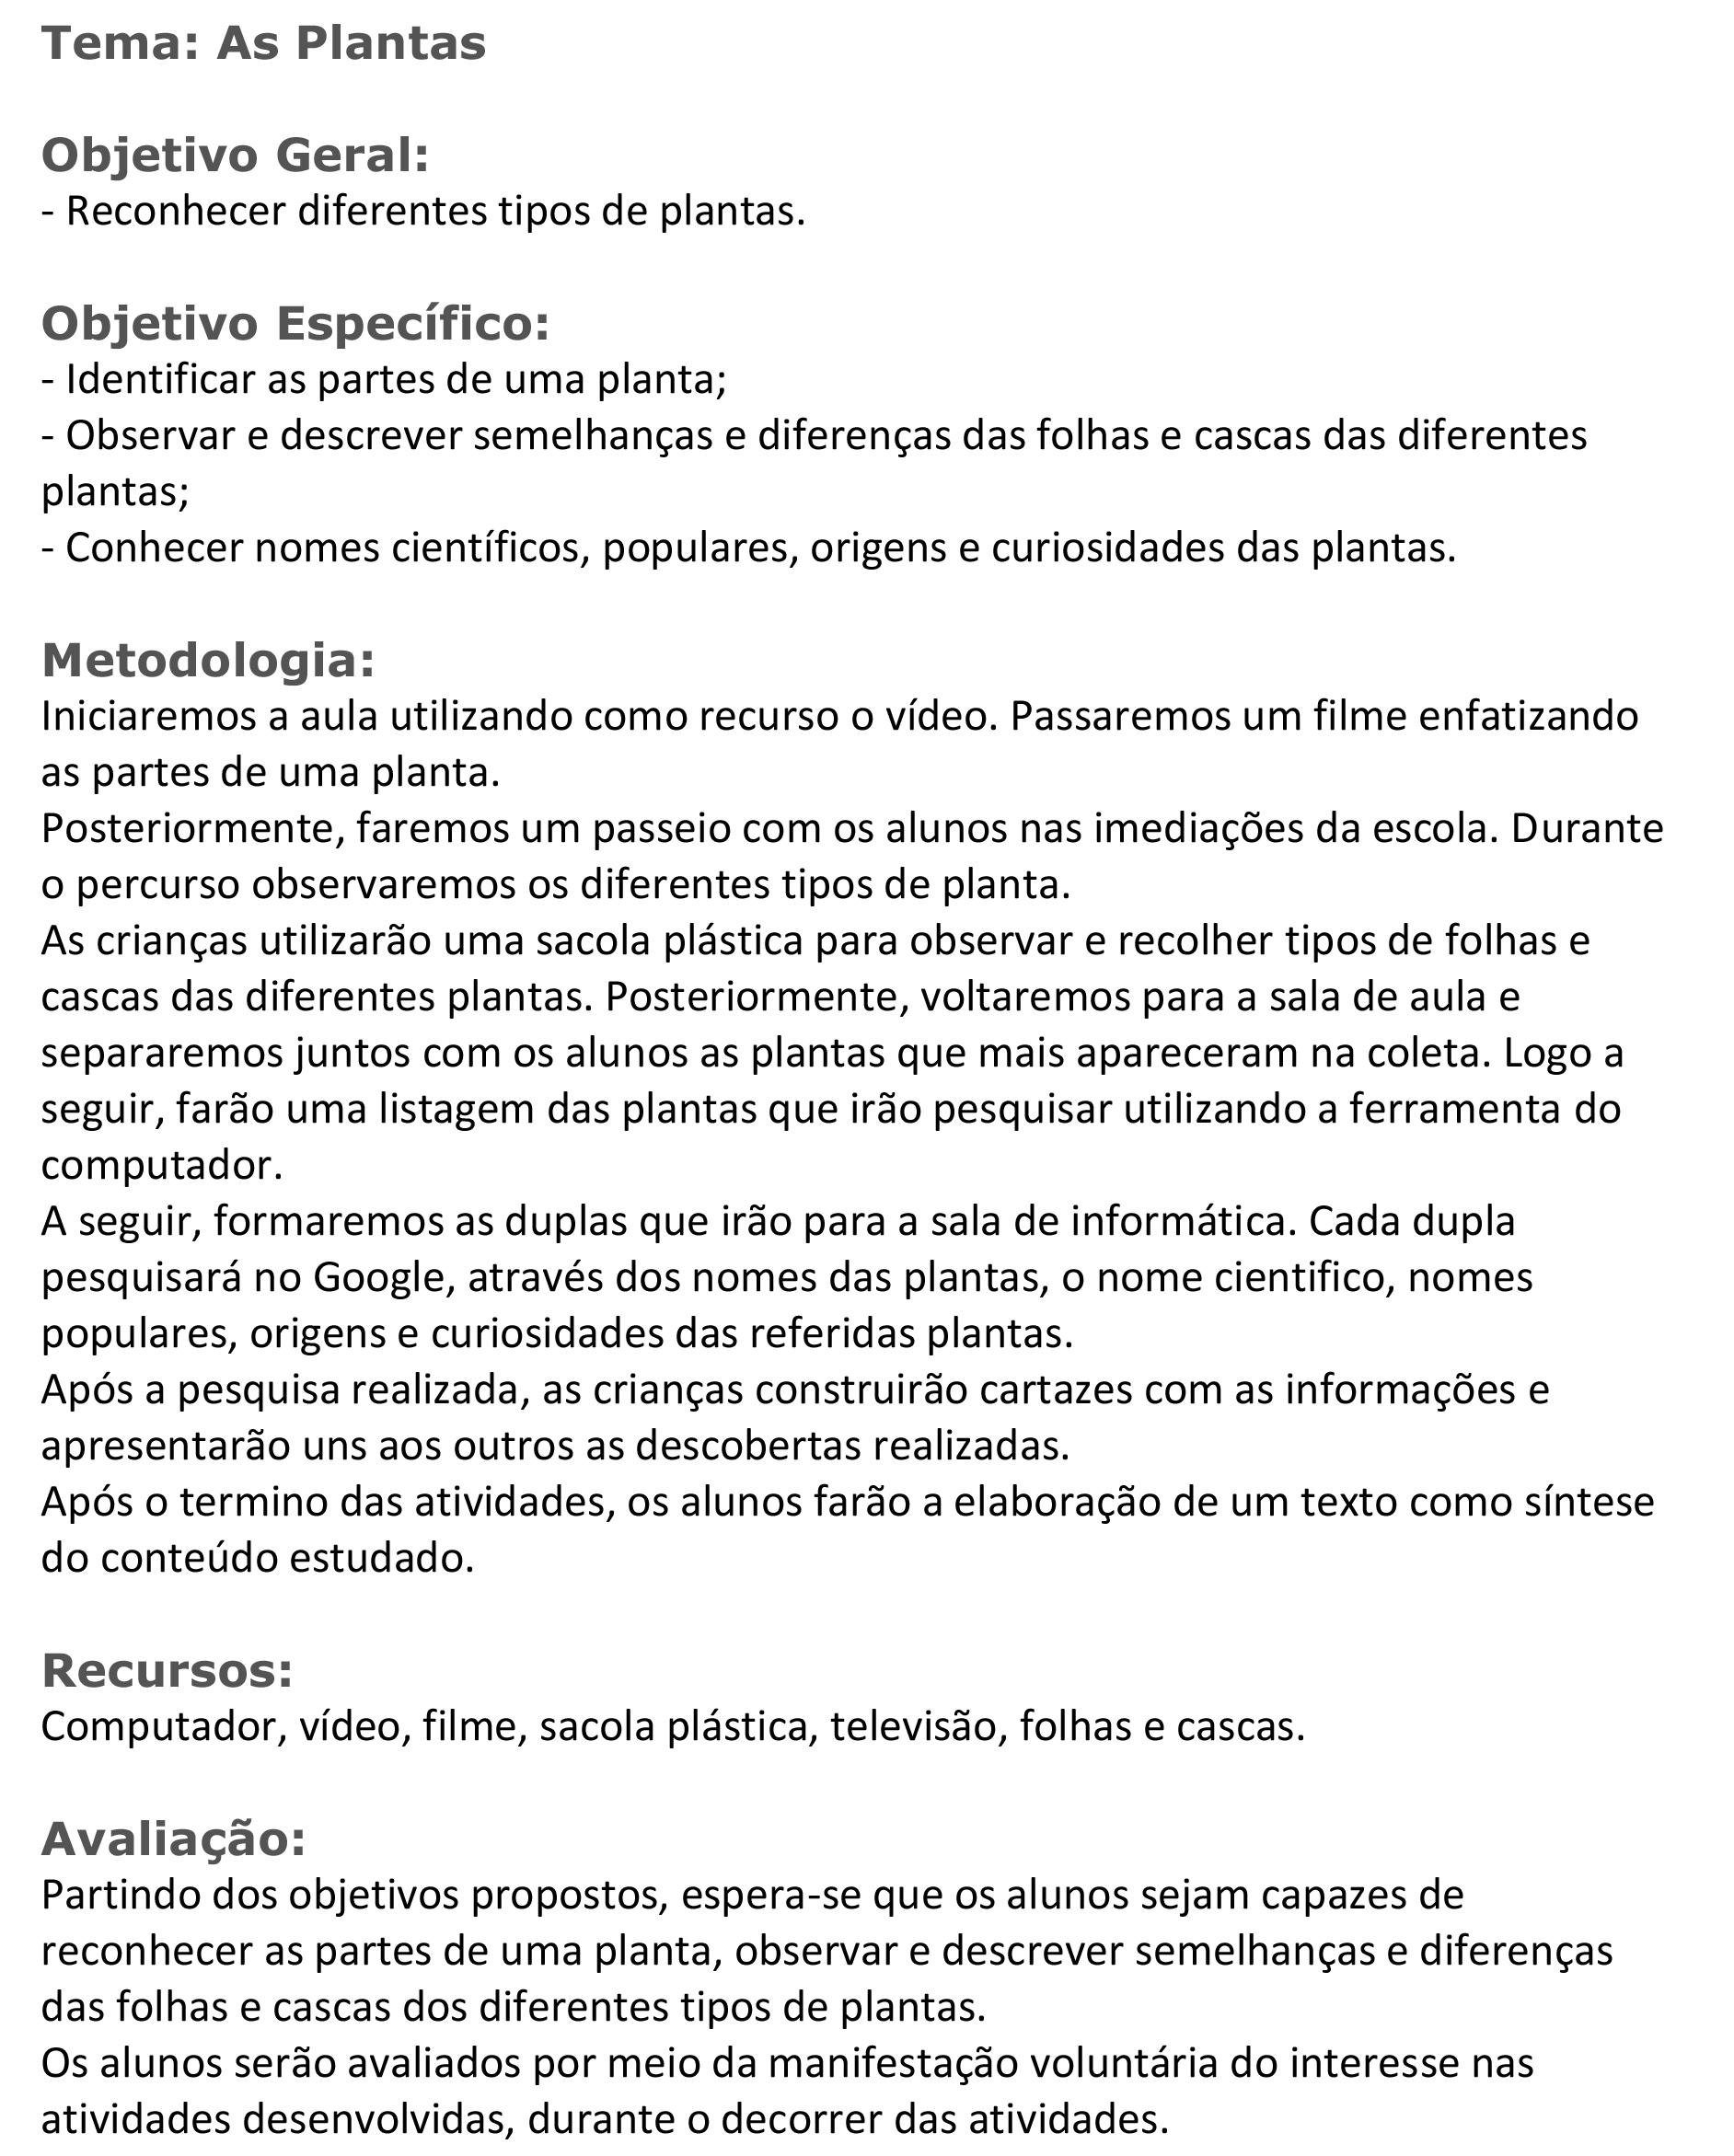 Plano de aula - Profª Maria Jocélia Cosmo - Observar